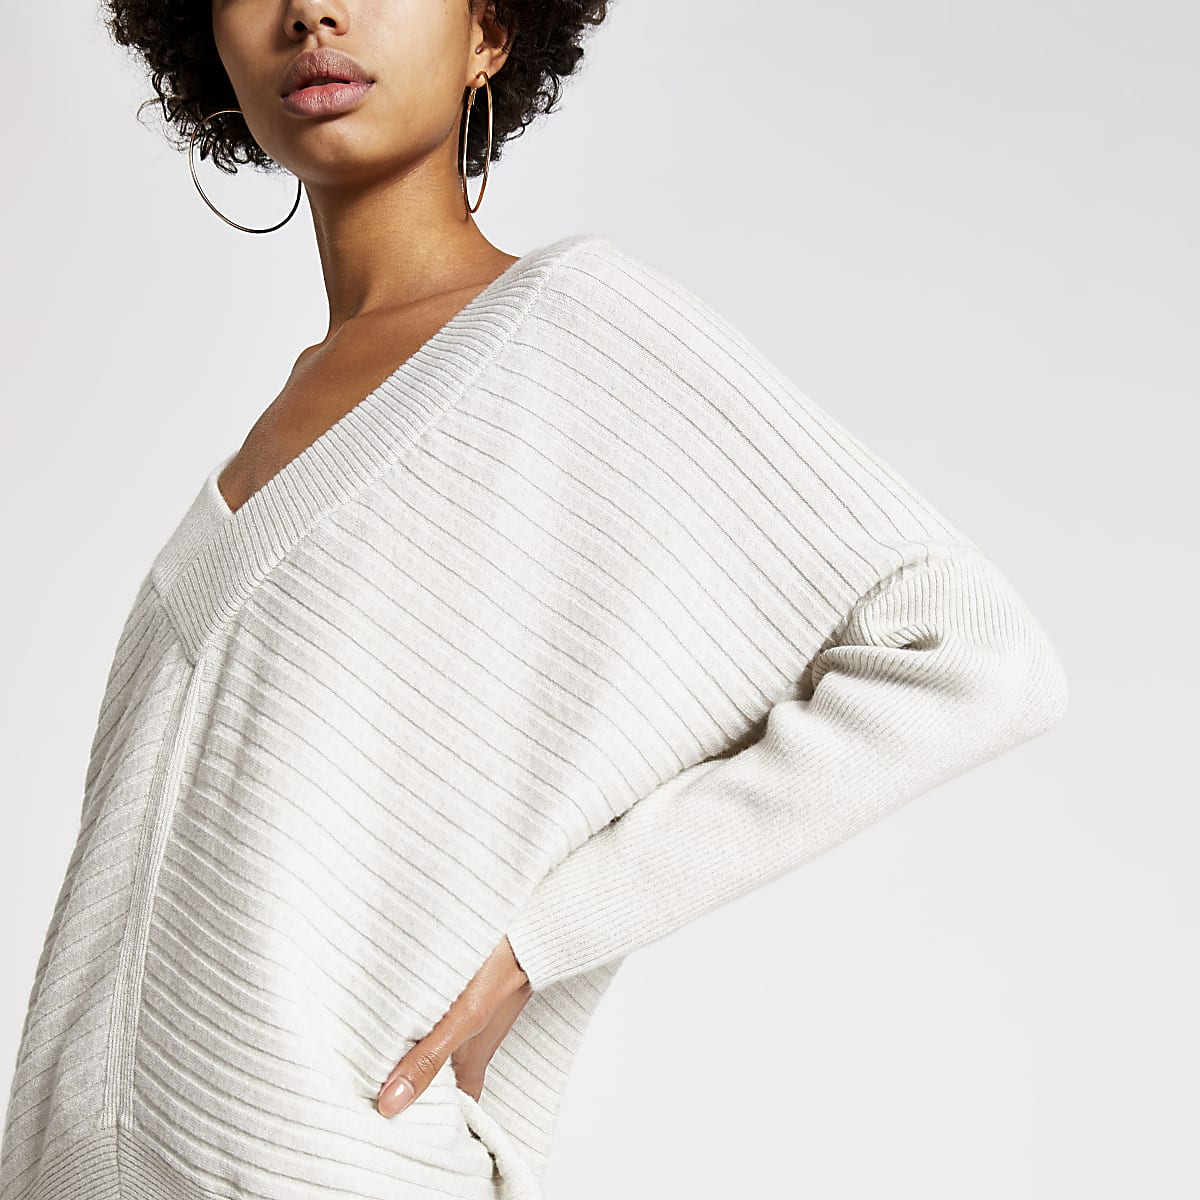 Crème gebreide geribbelde pullover met V-hals